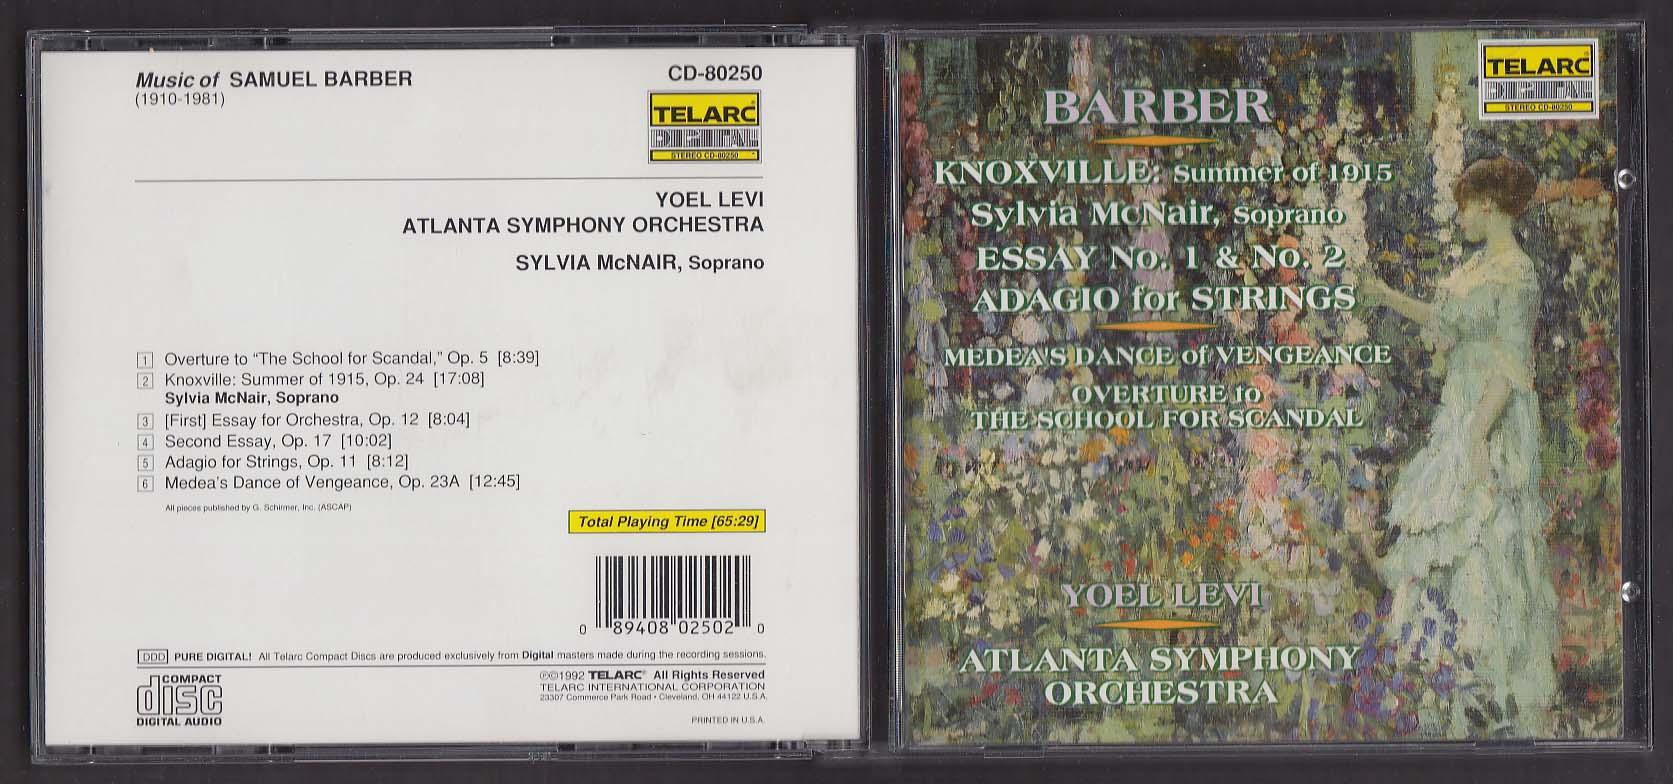 Atlanta Symphony Orchestra: Samuel Barber TELARC CD-80250 CD 1992